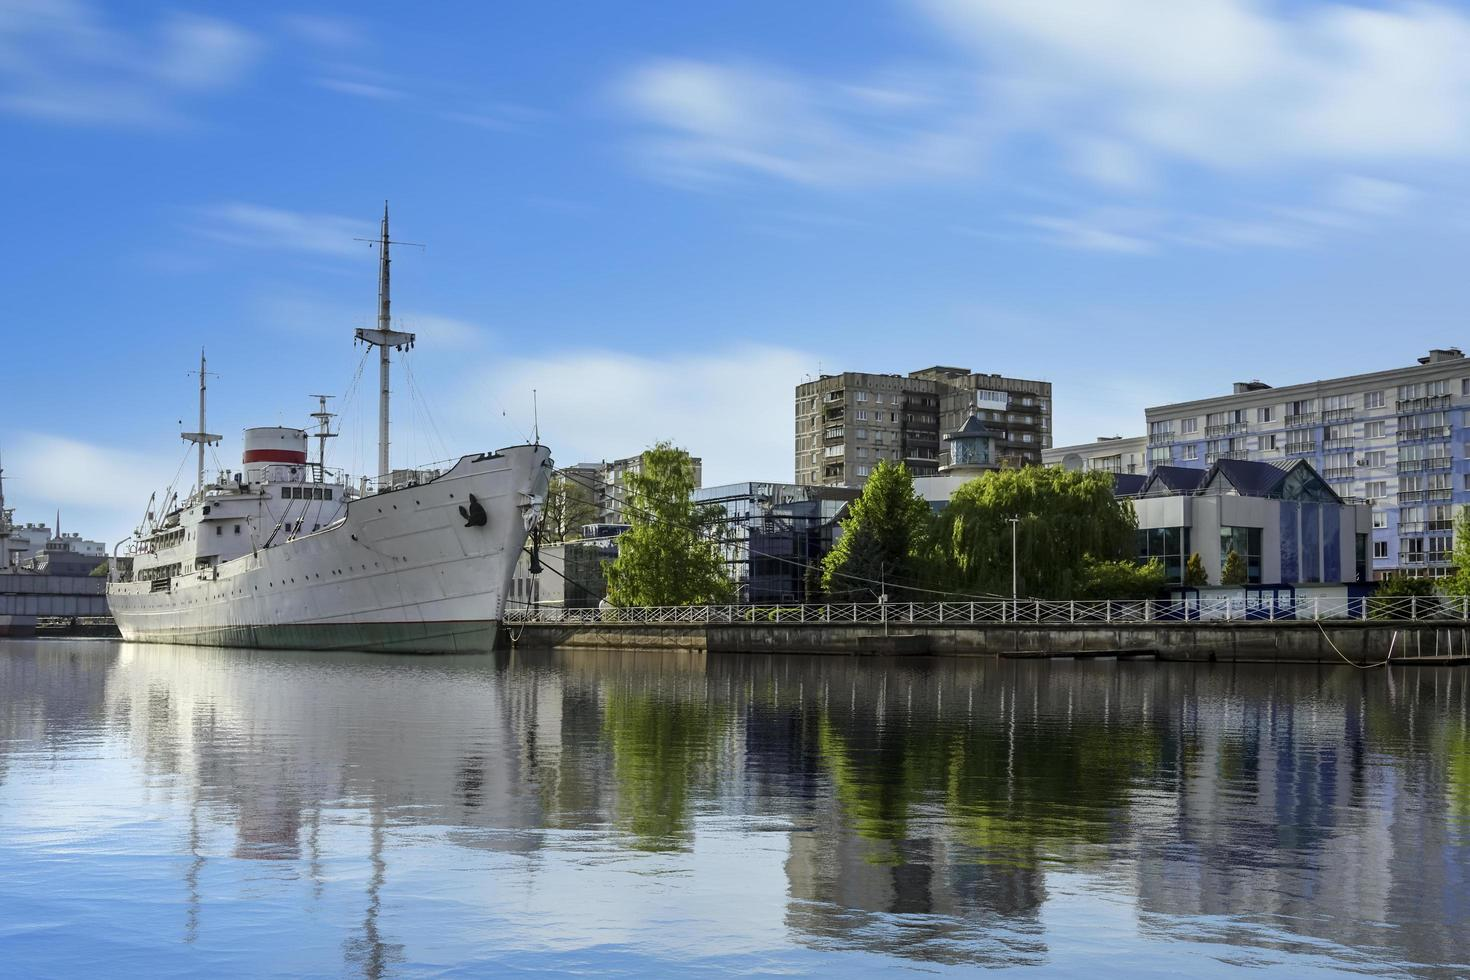 Kaliningrader Stadtlandschaft mit Blick auf den Pregolya-Fluss foto